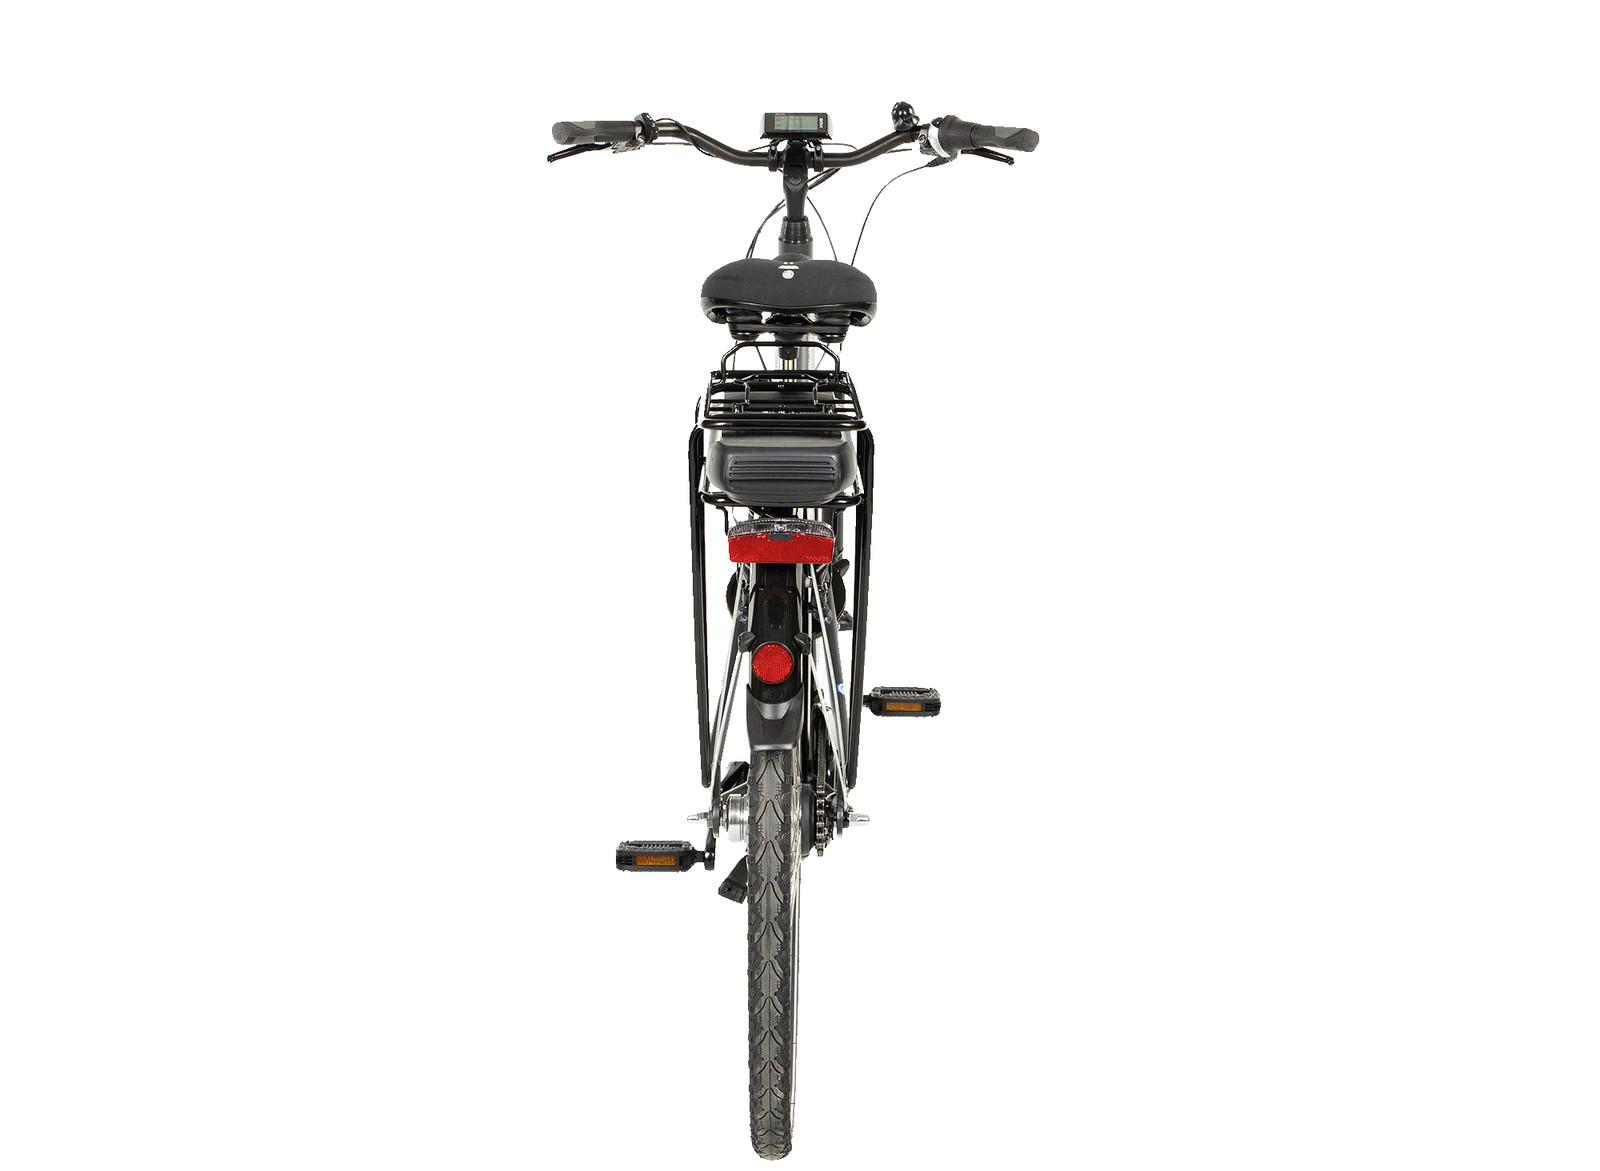 FISCHER ECU 1401-S1, Pedelec, Citybike, 44 cm, 28 Zoll, 25 ...